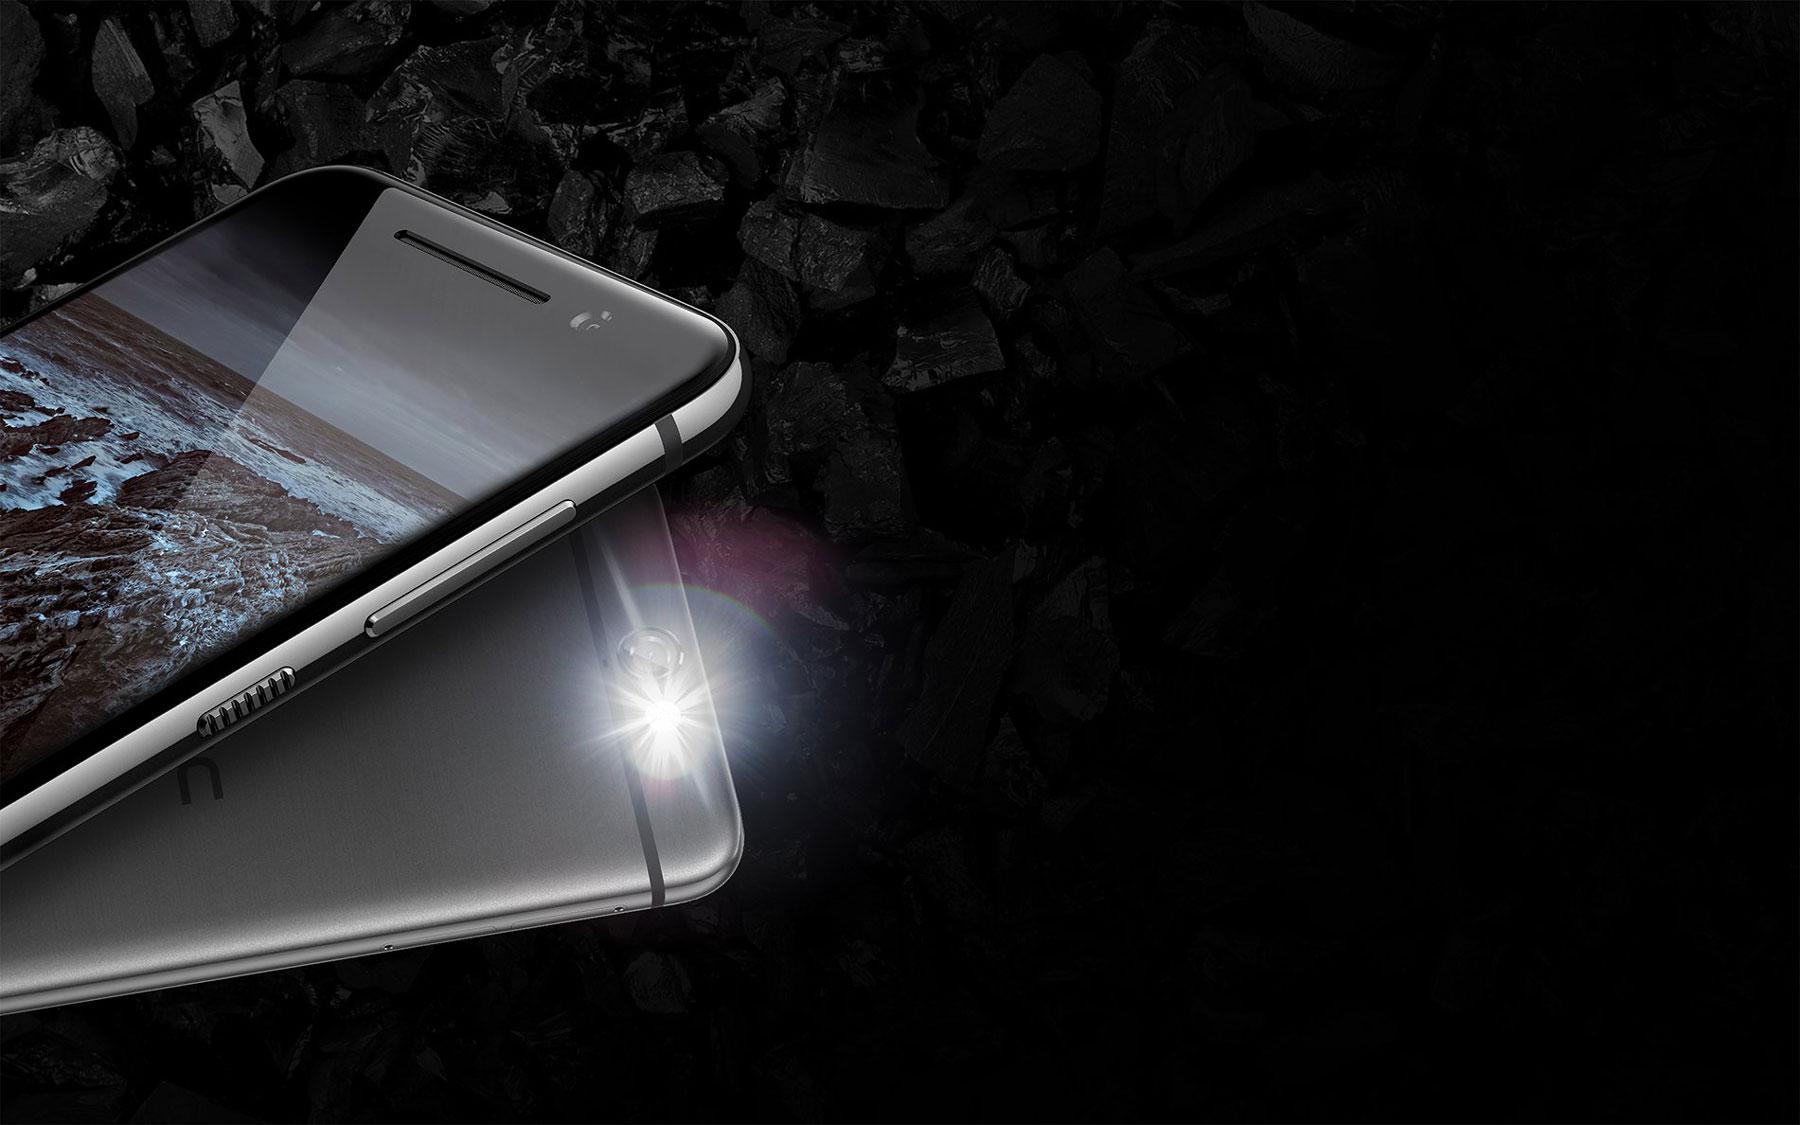 HTC One A9 detalle del flash